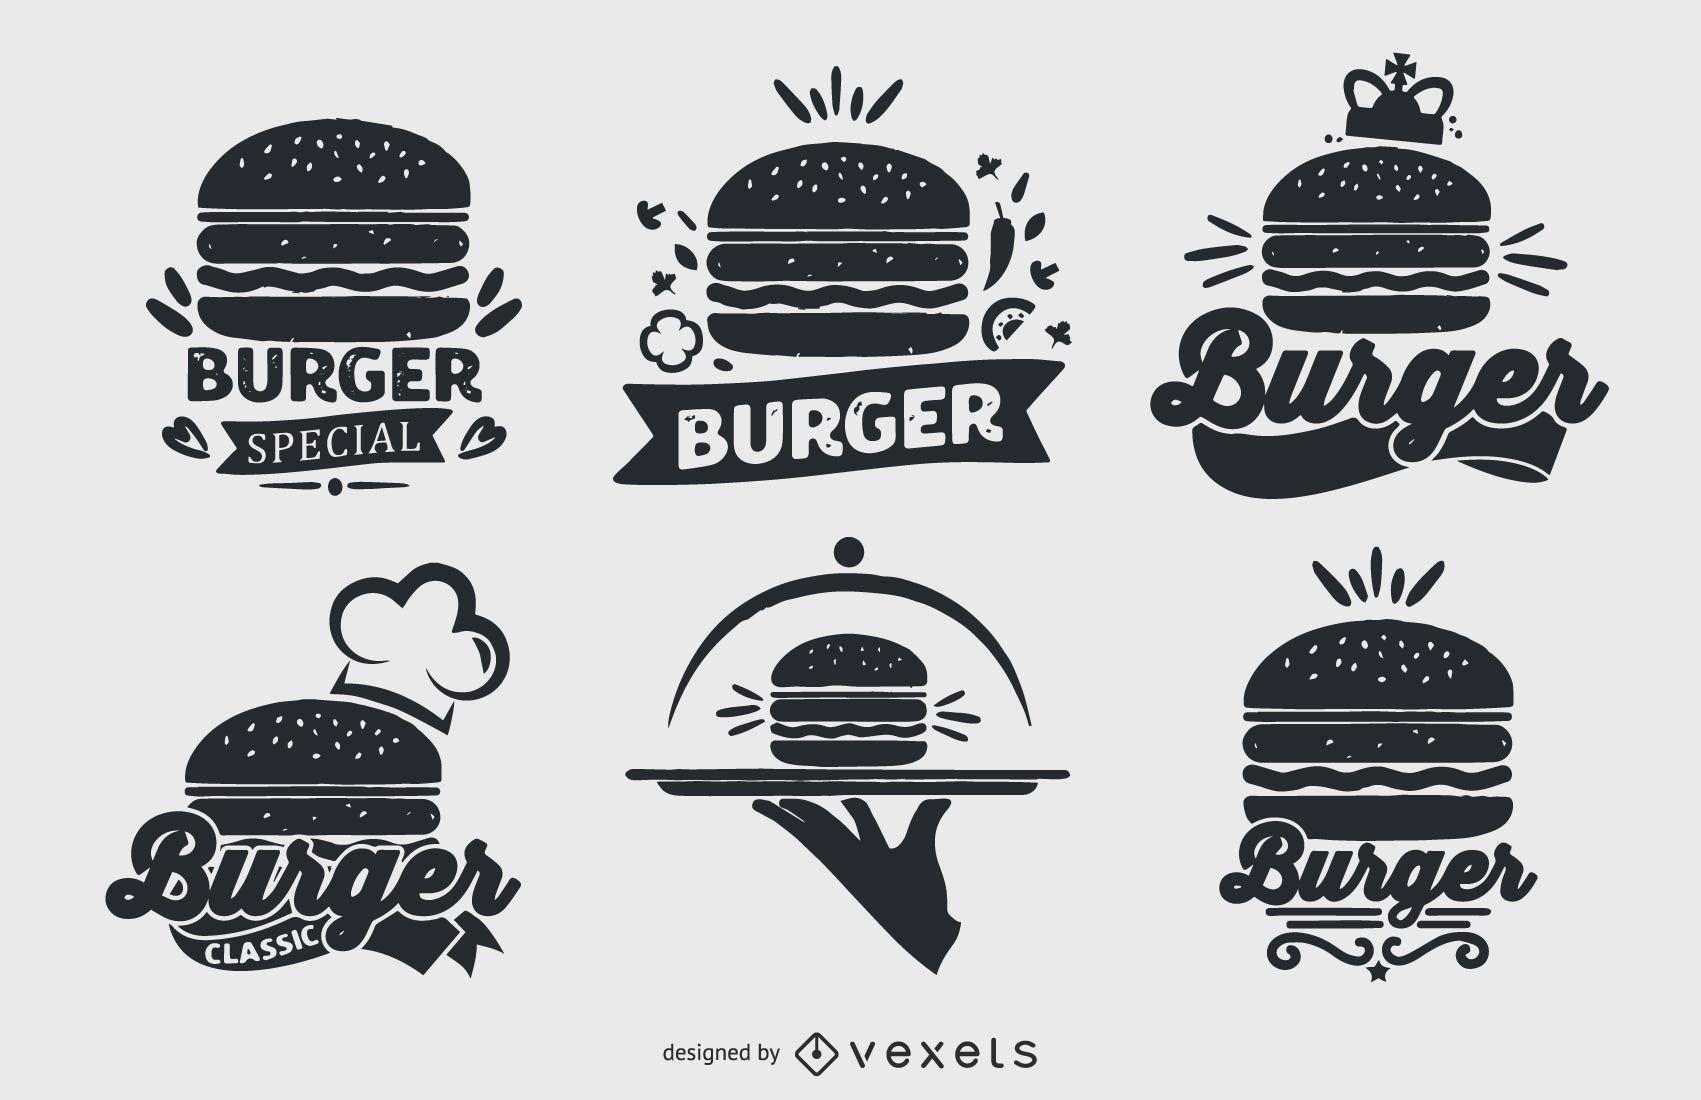 Burger logo collection set